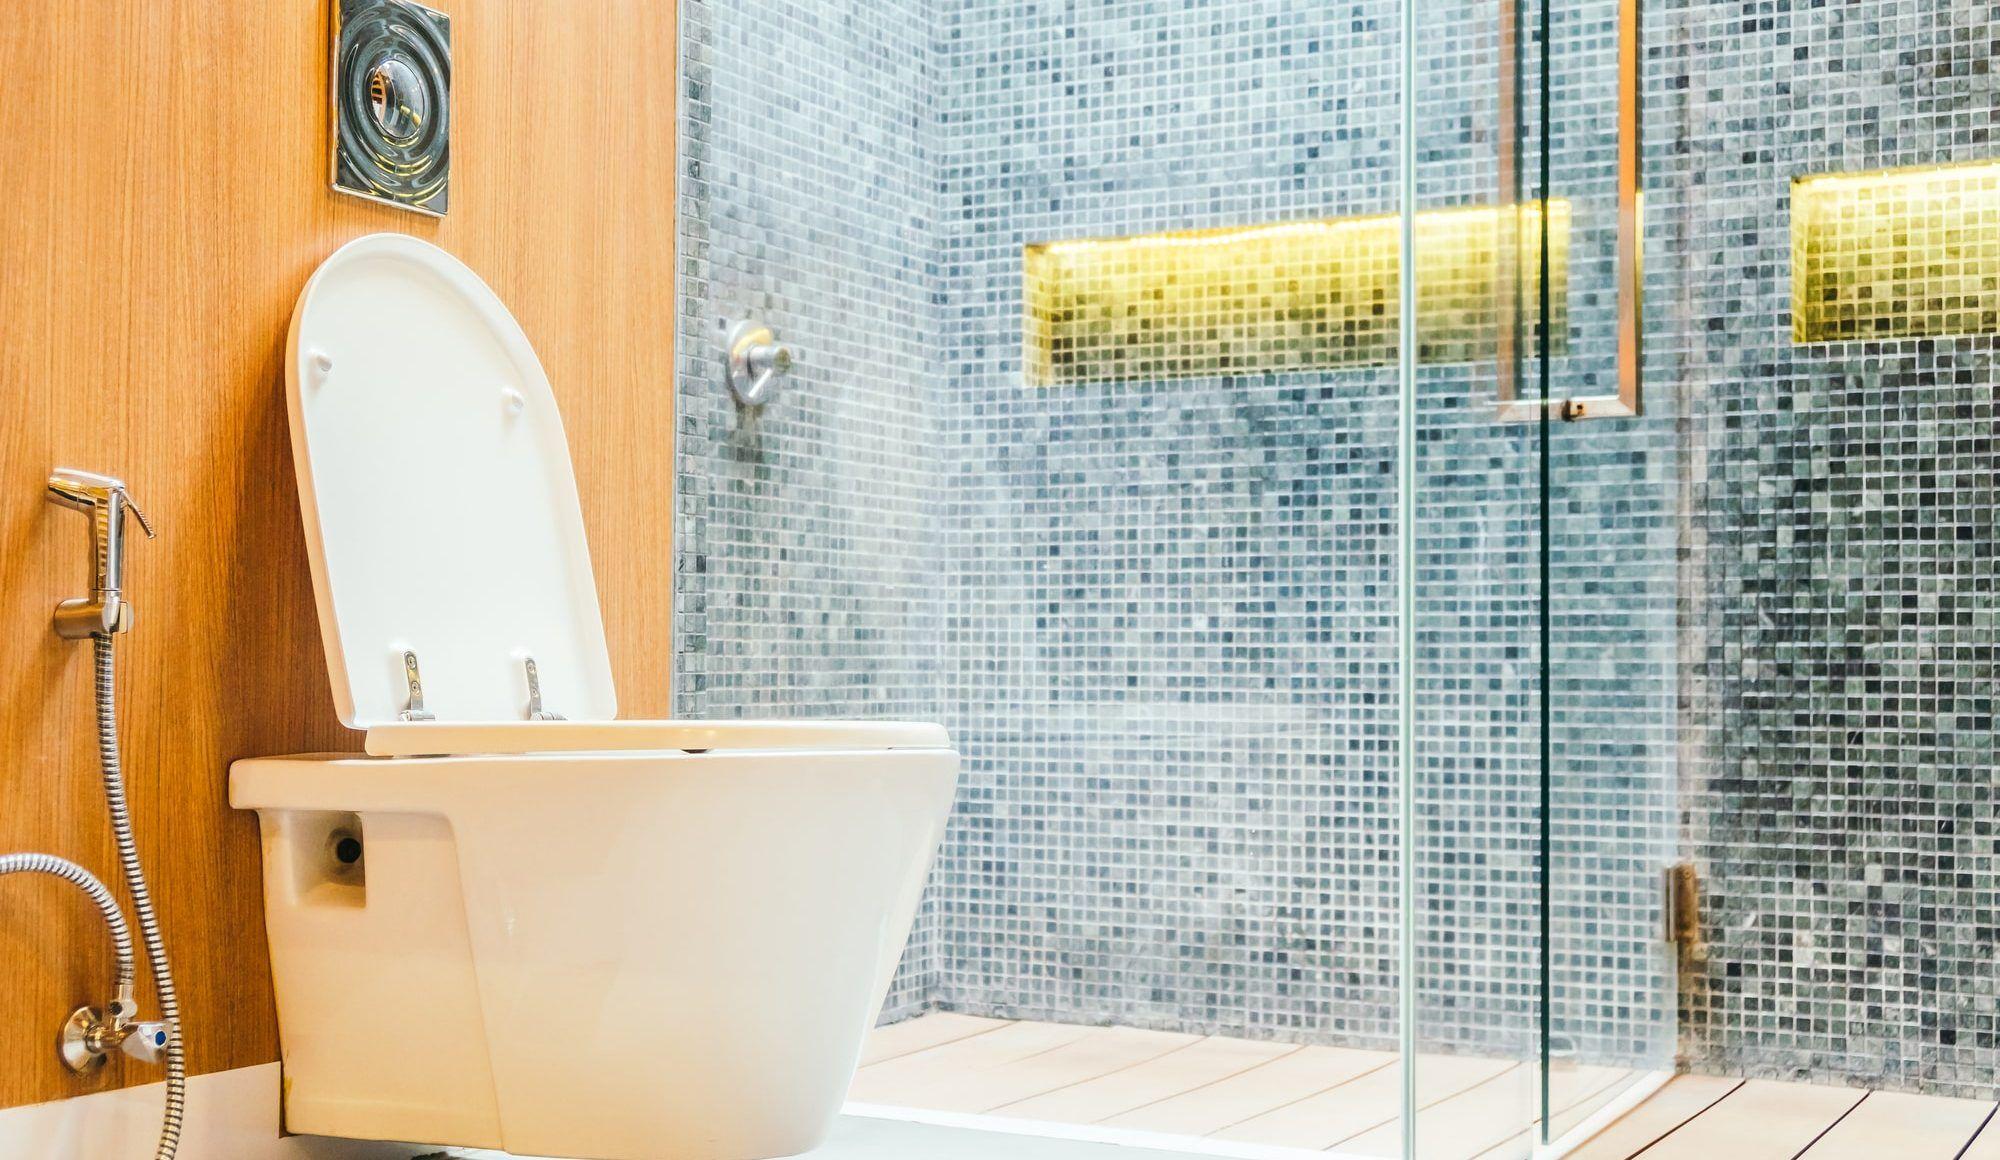 Bathroom Plumbing Bathroom Plumbers Near Me 24 Hours Bathroom Plumbing Bathroom Installation Toilet Installation